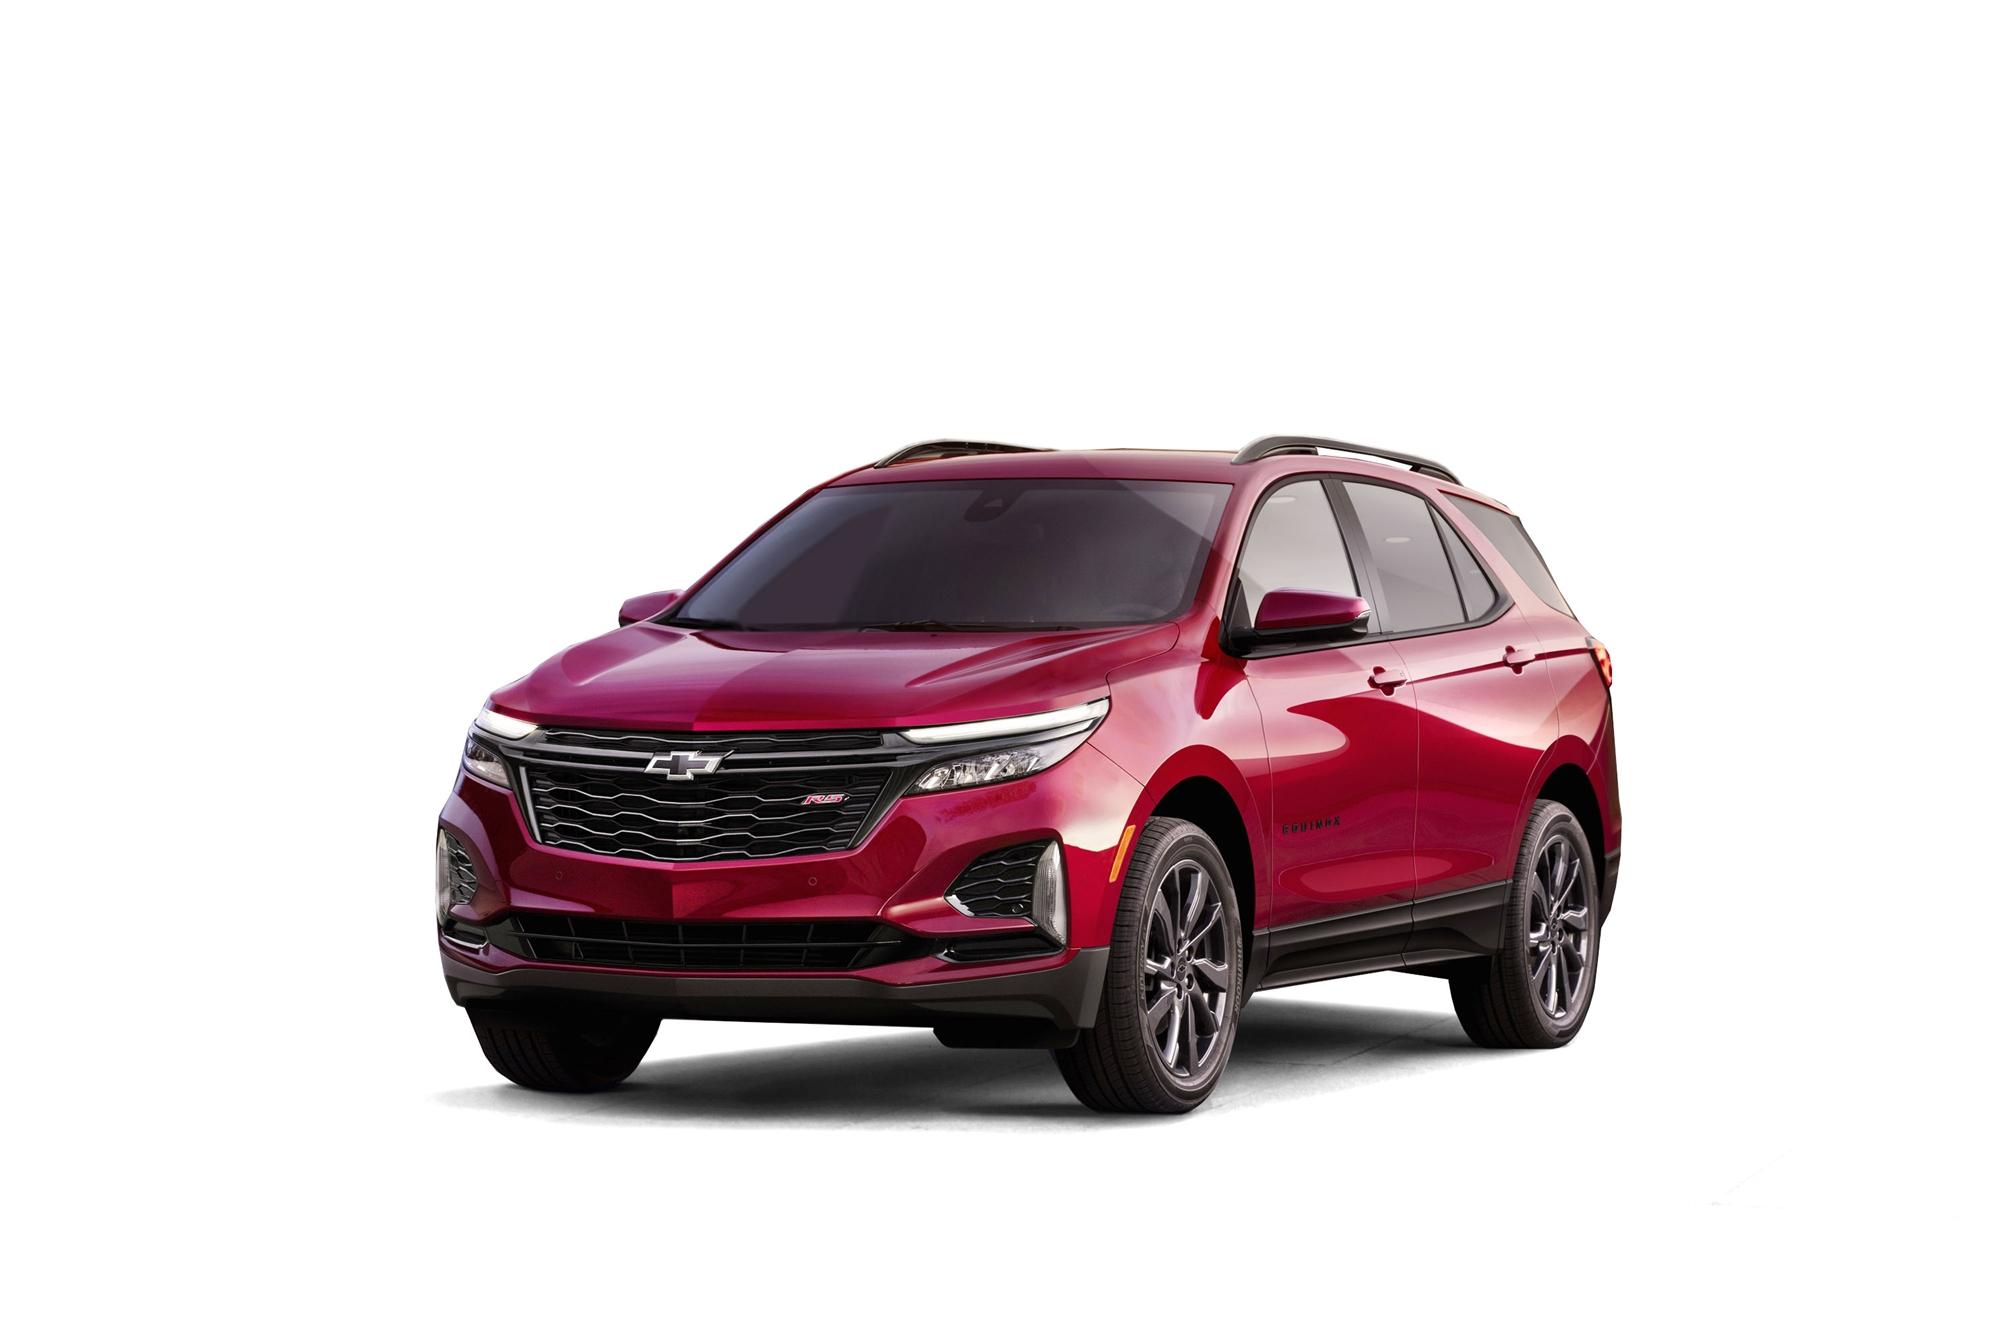 2021 Chevrolet Equinox Premier Full Specs, Features and ...